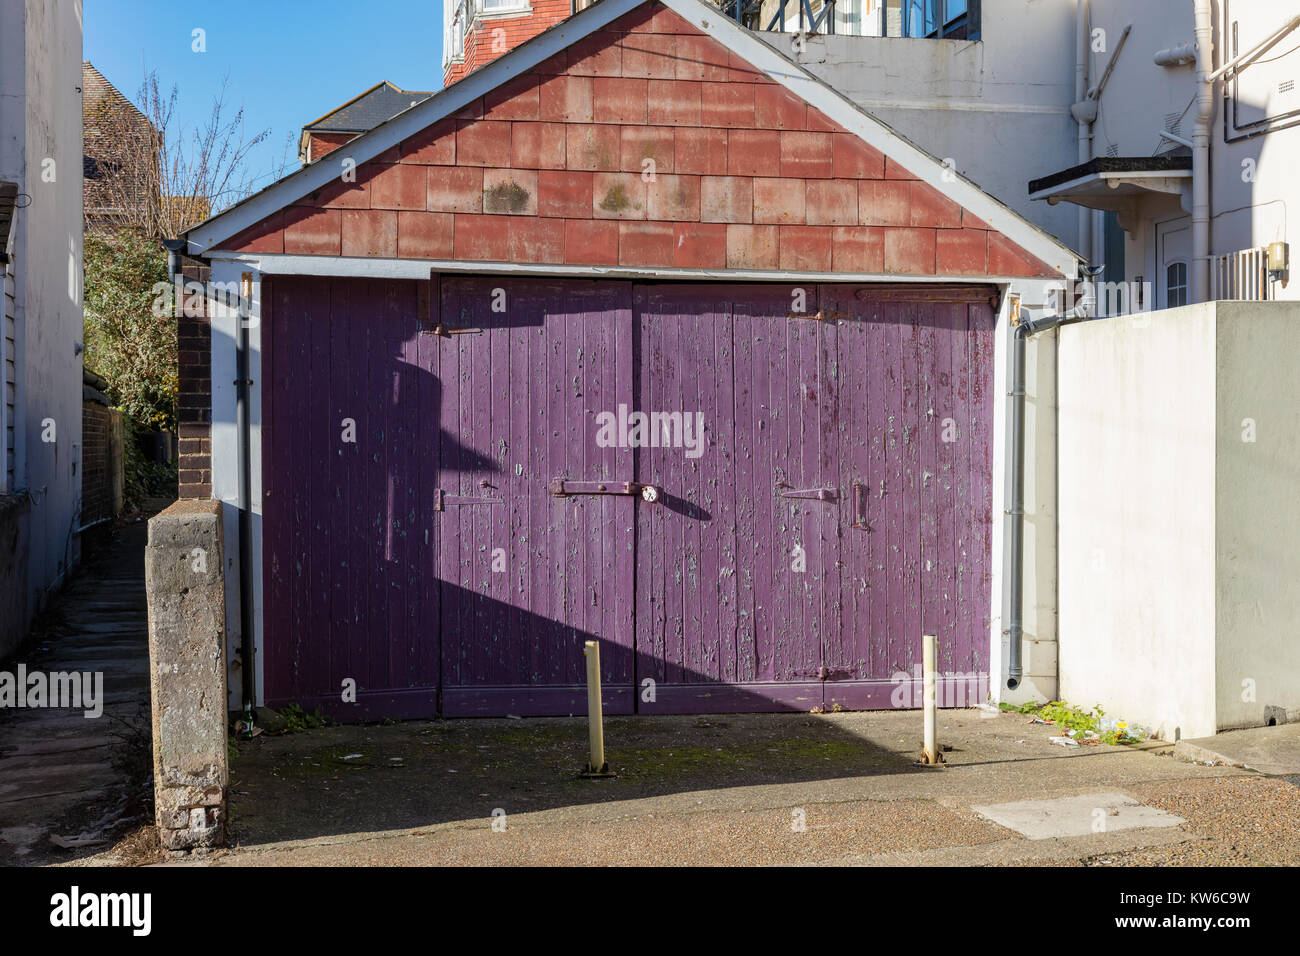 Holz Garagentor Mit Peeling Violette Farbe In Bexhill On Sea, East Sussex,  Großbritannien